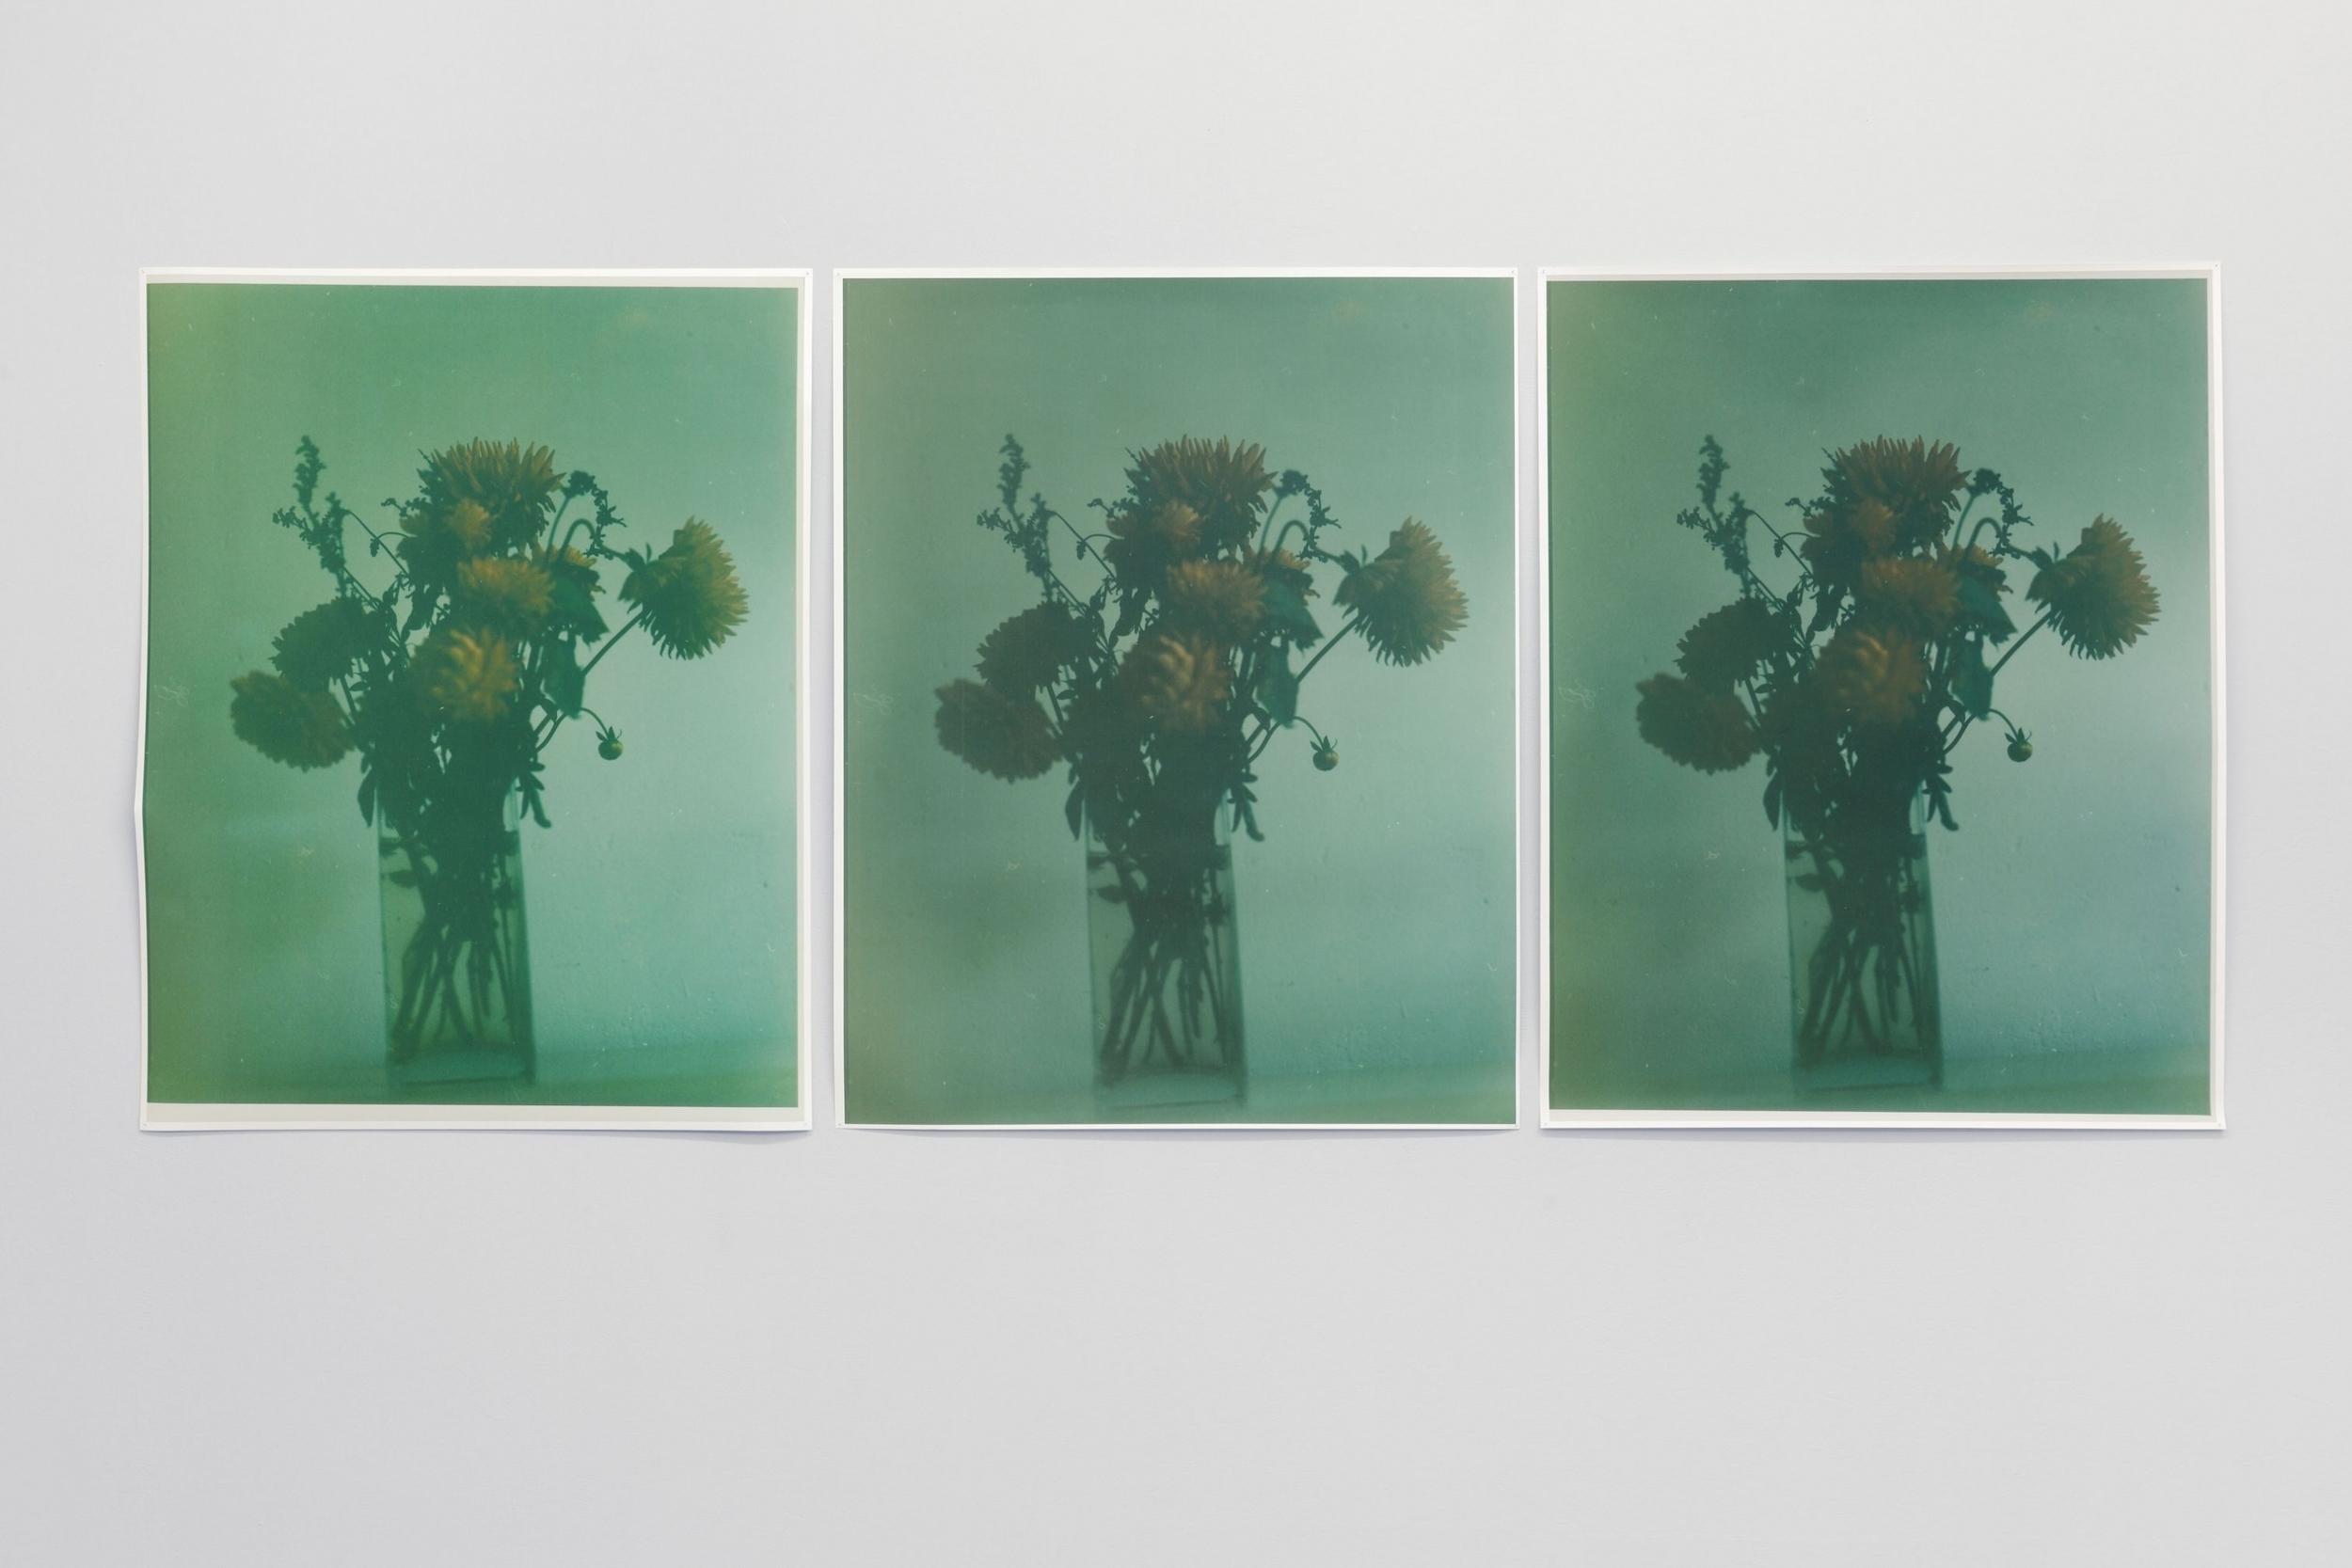 Inga Kerber  (Cliché of a Flower Bouquet) II, 2010-12  Pigmentdrucke, je 107 x 85 cm  © Inga Kerber